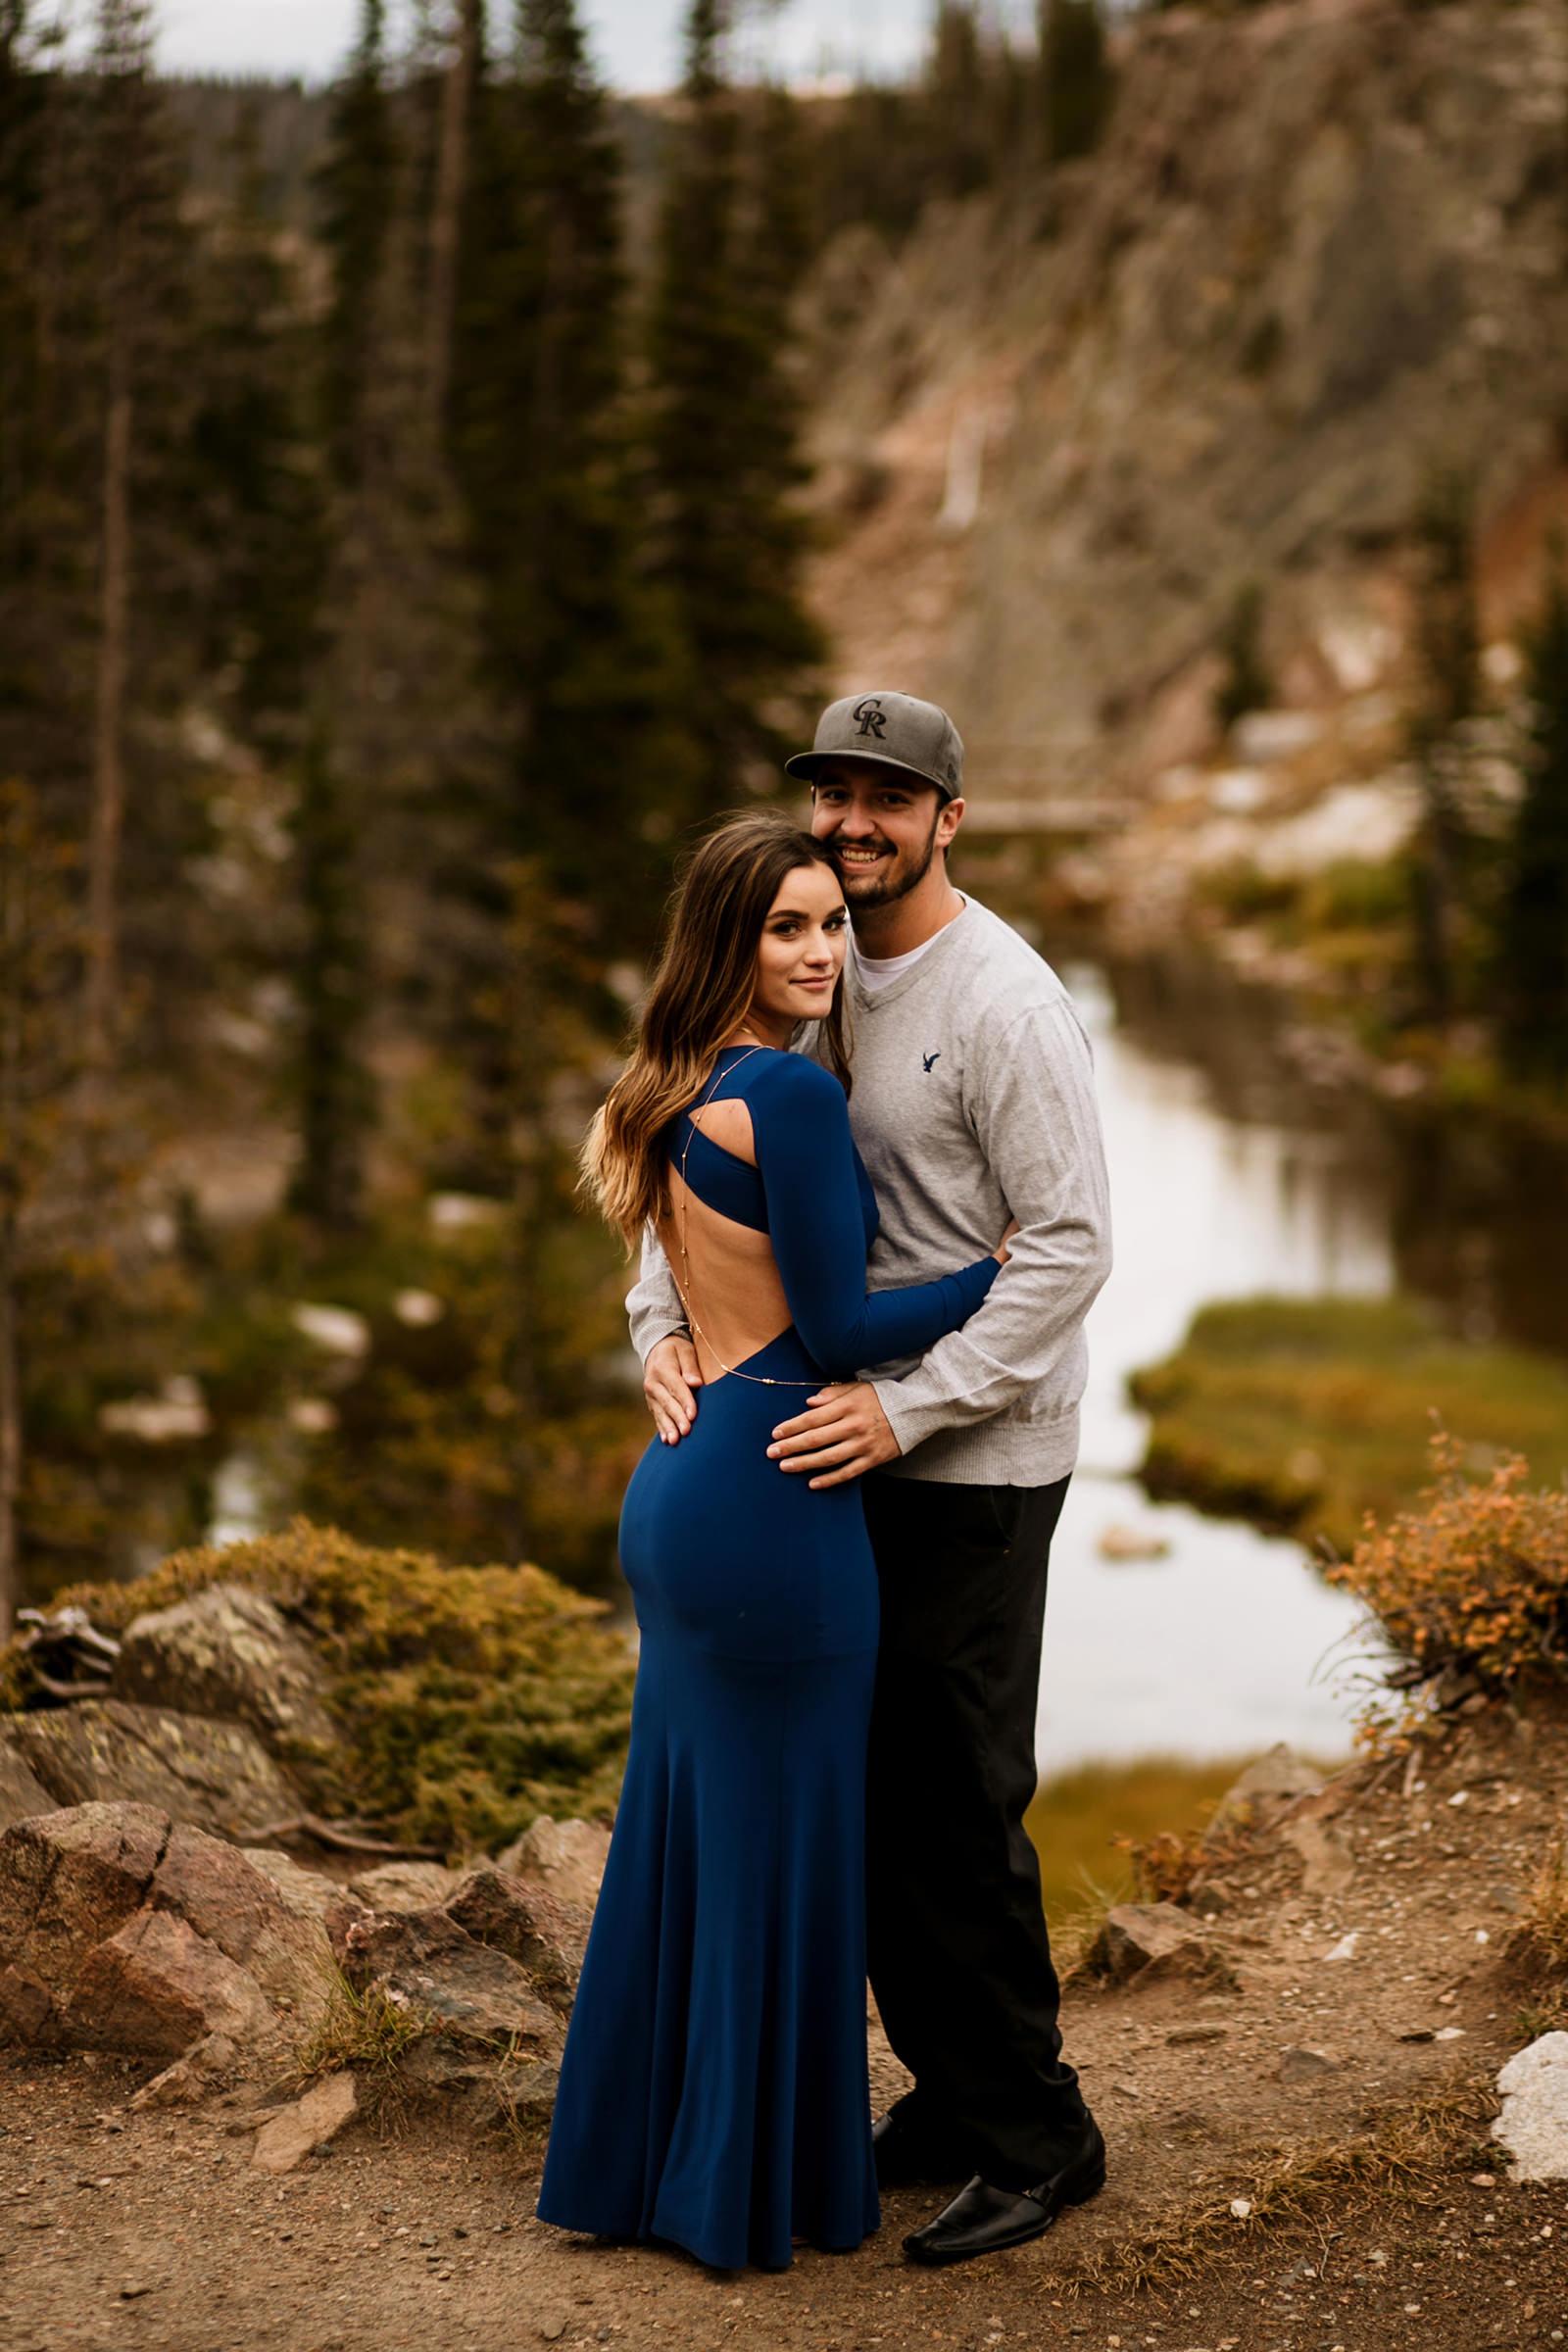 Liz Osban Photography Cheyenne Wyoming Engagement Wedding Photographer couple adventure elopement wedding laramie denver fort collins colorado rocky mountain national park31.jpg